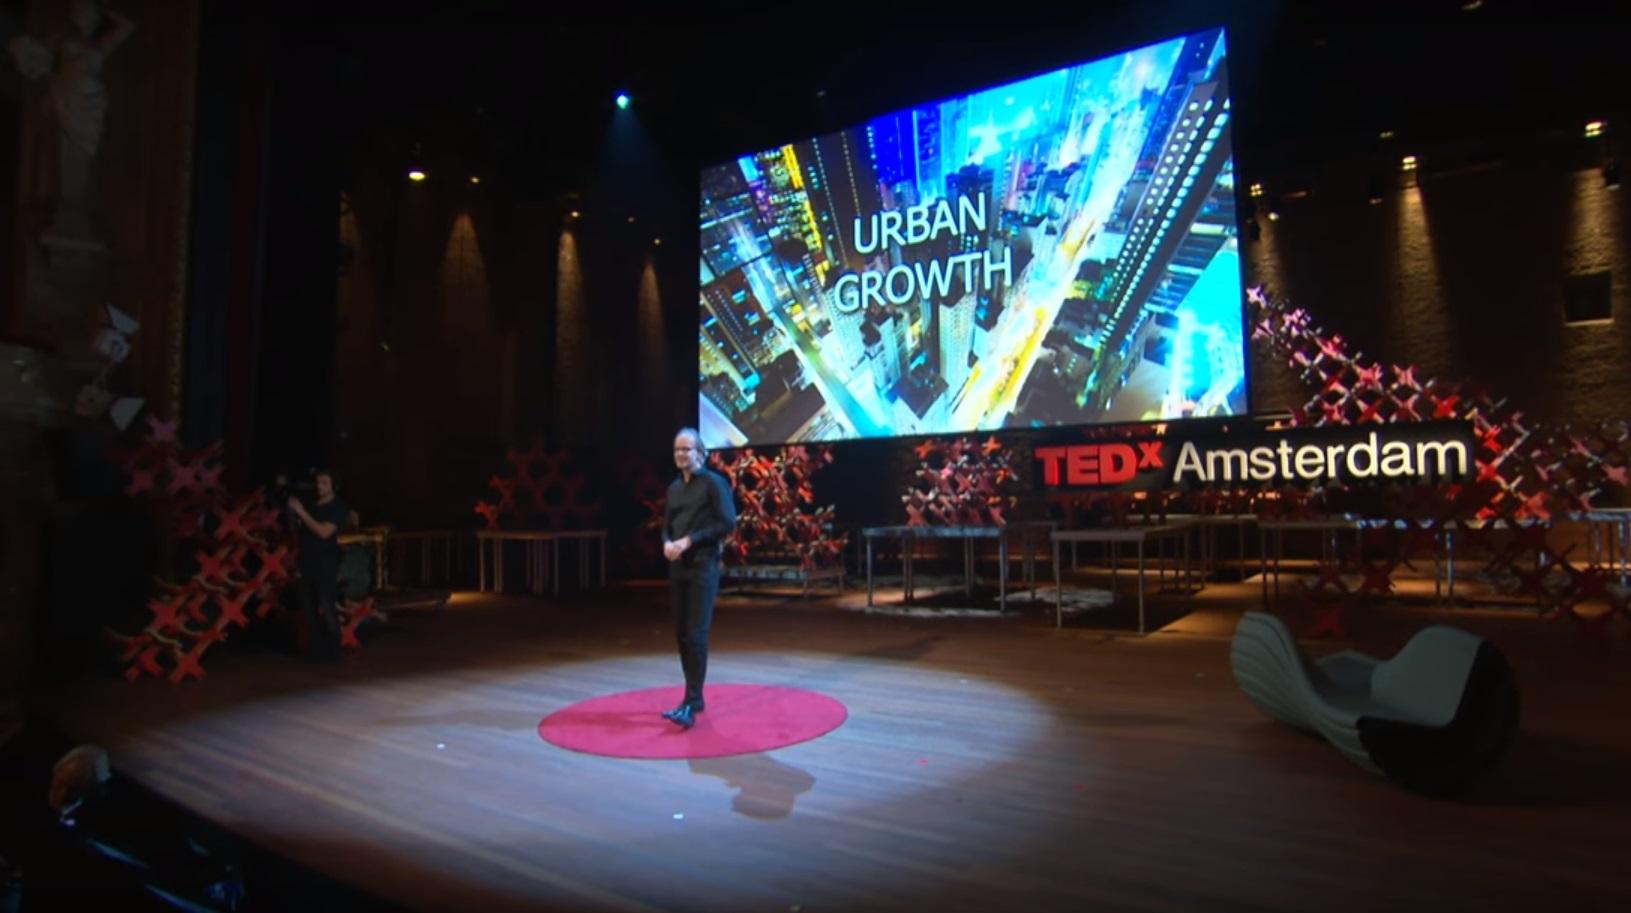 201812 TEDx Amsterdam Future of cities